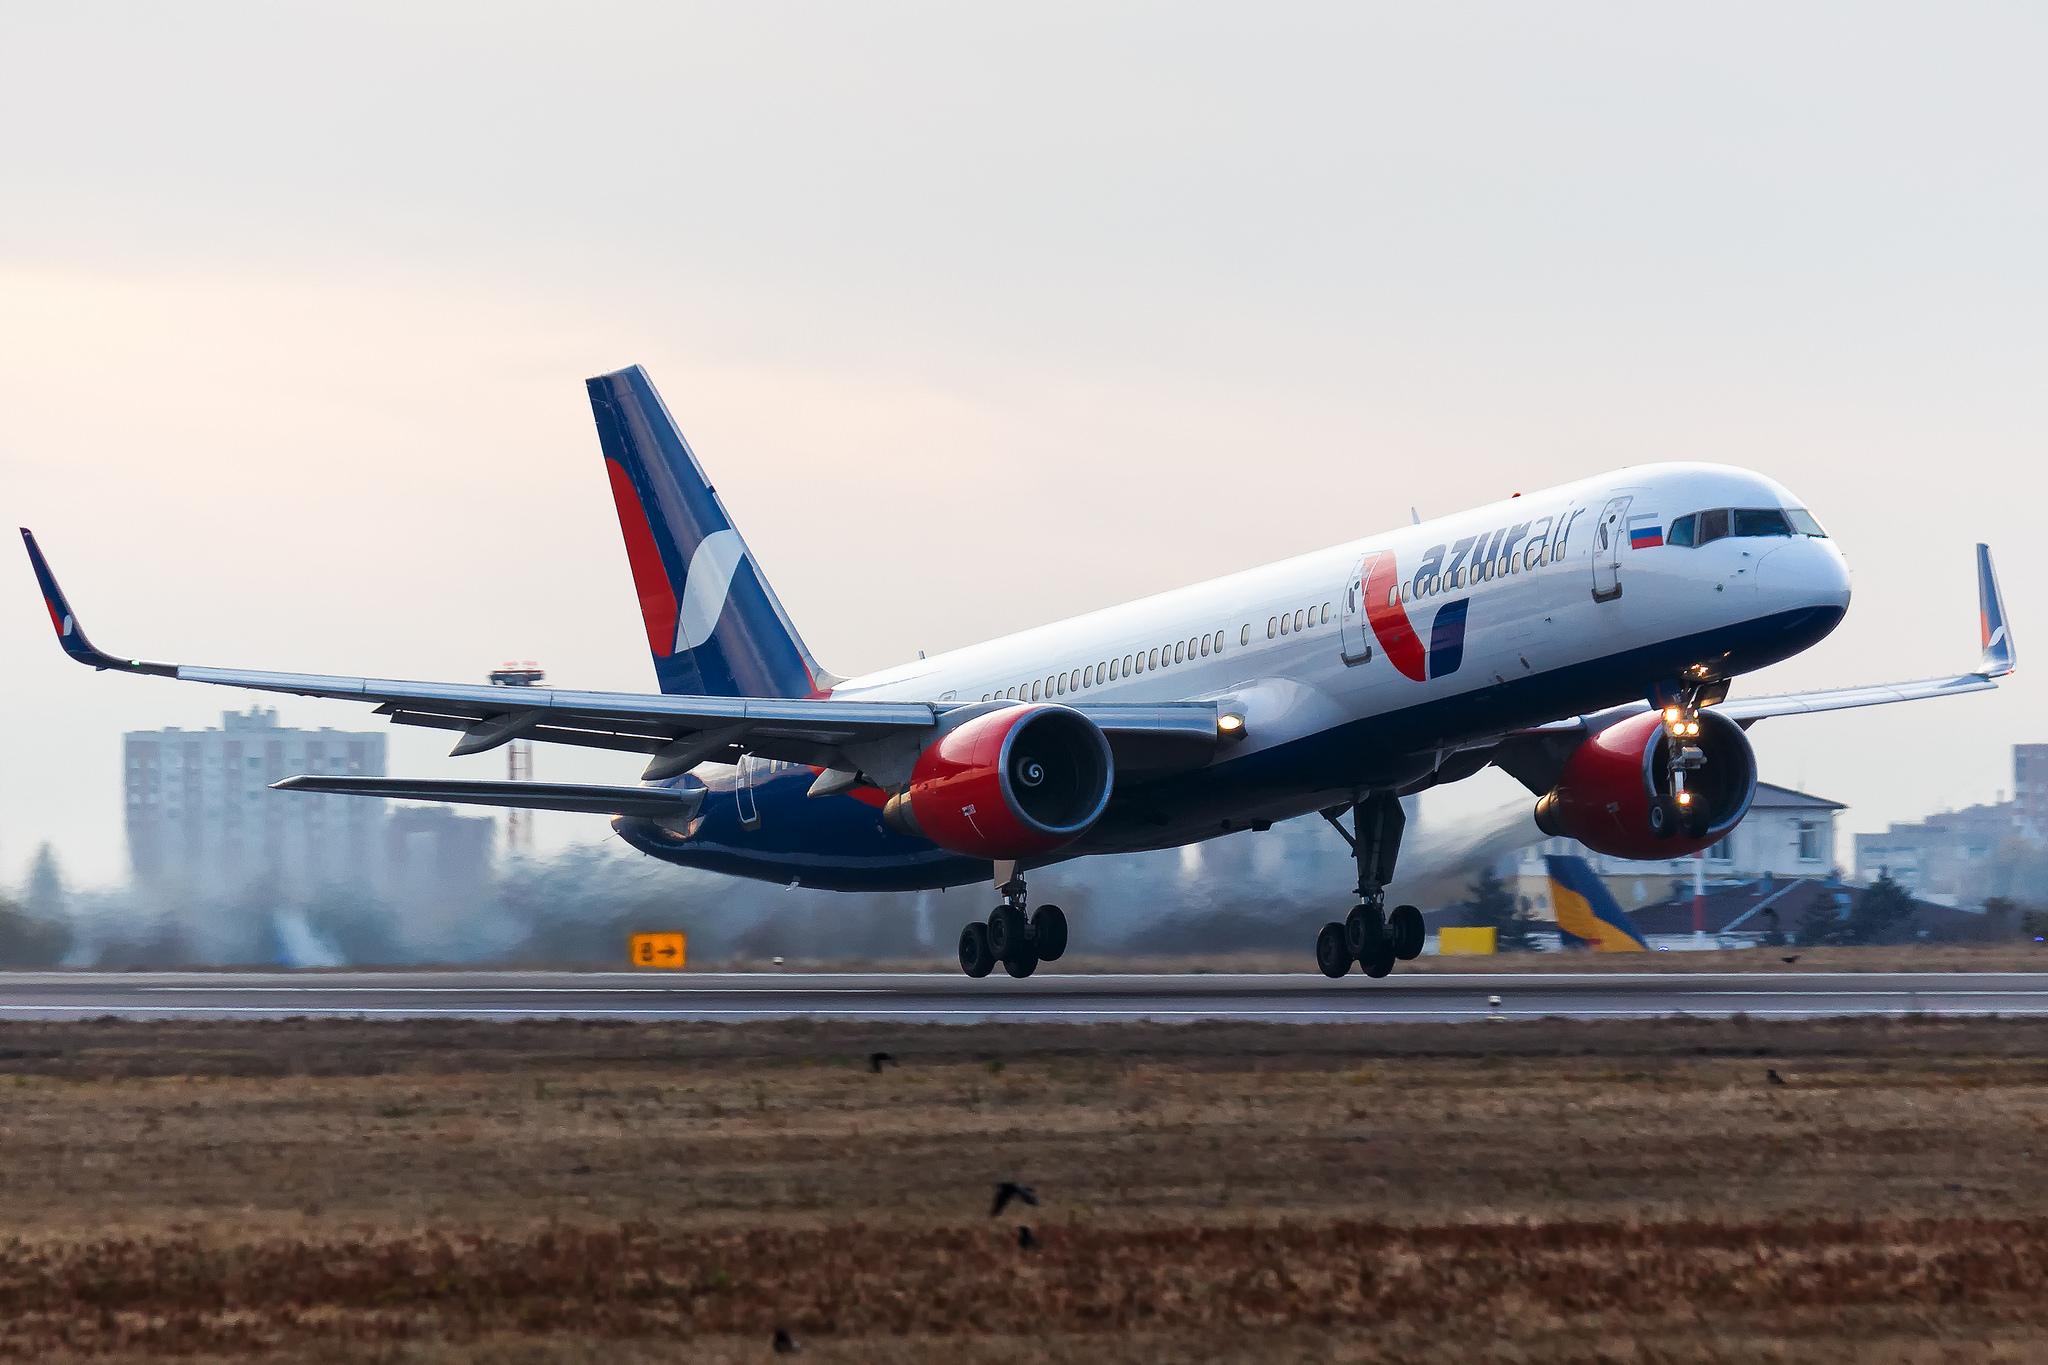 Аэропорт Кольцово онлайн табло вылета Билеты на самолет